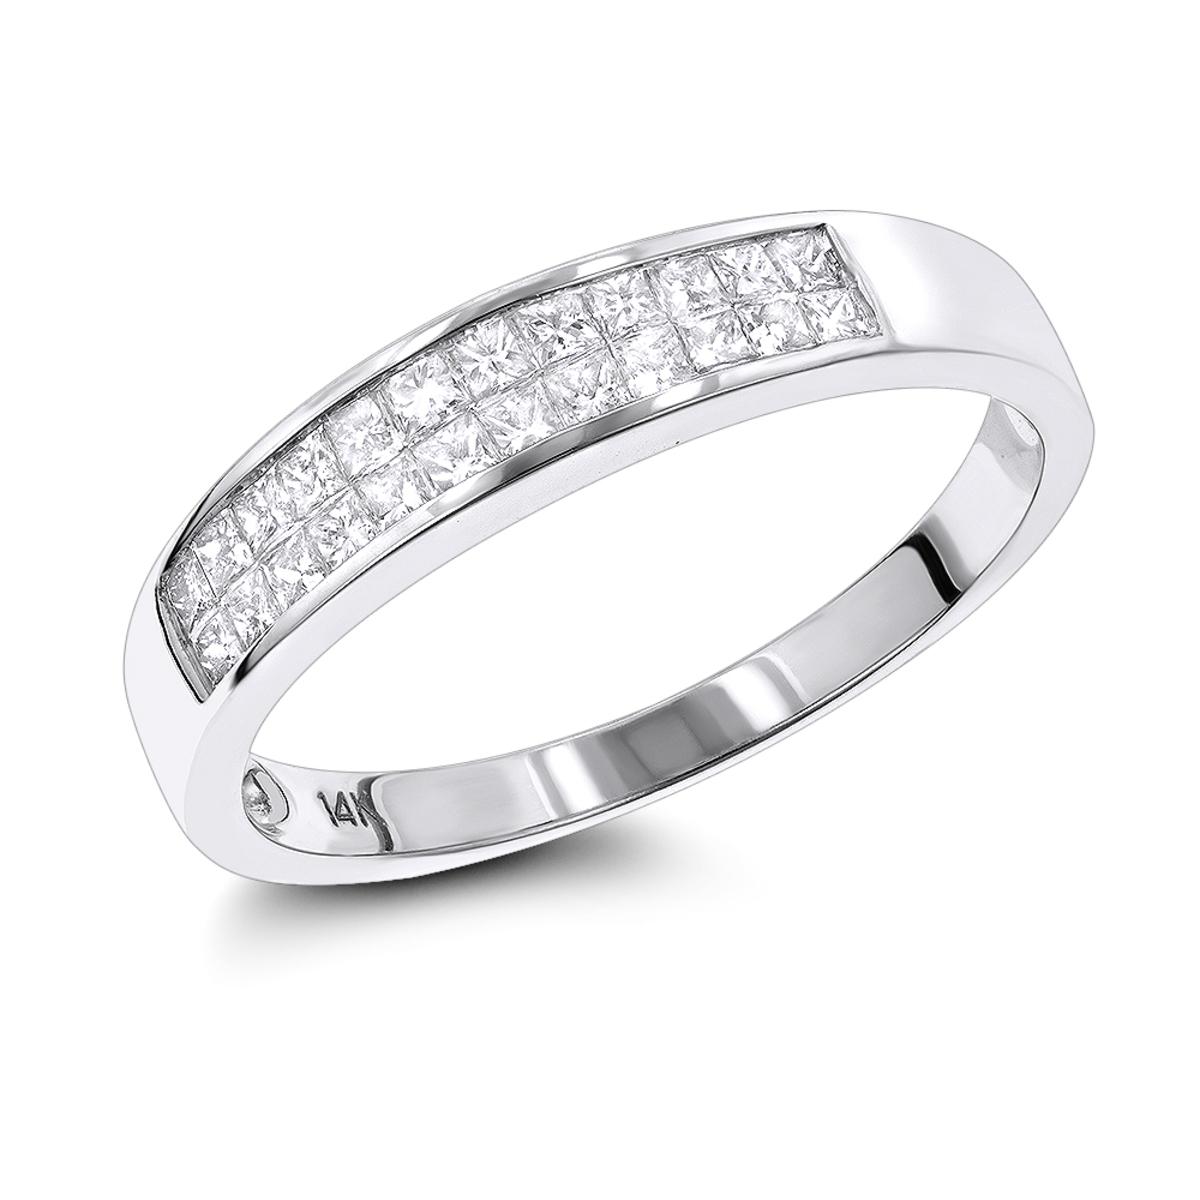 Thin Princess Cut Diamond Wedding Band for Women & Men 0.75ct 14K Gold